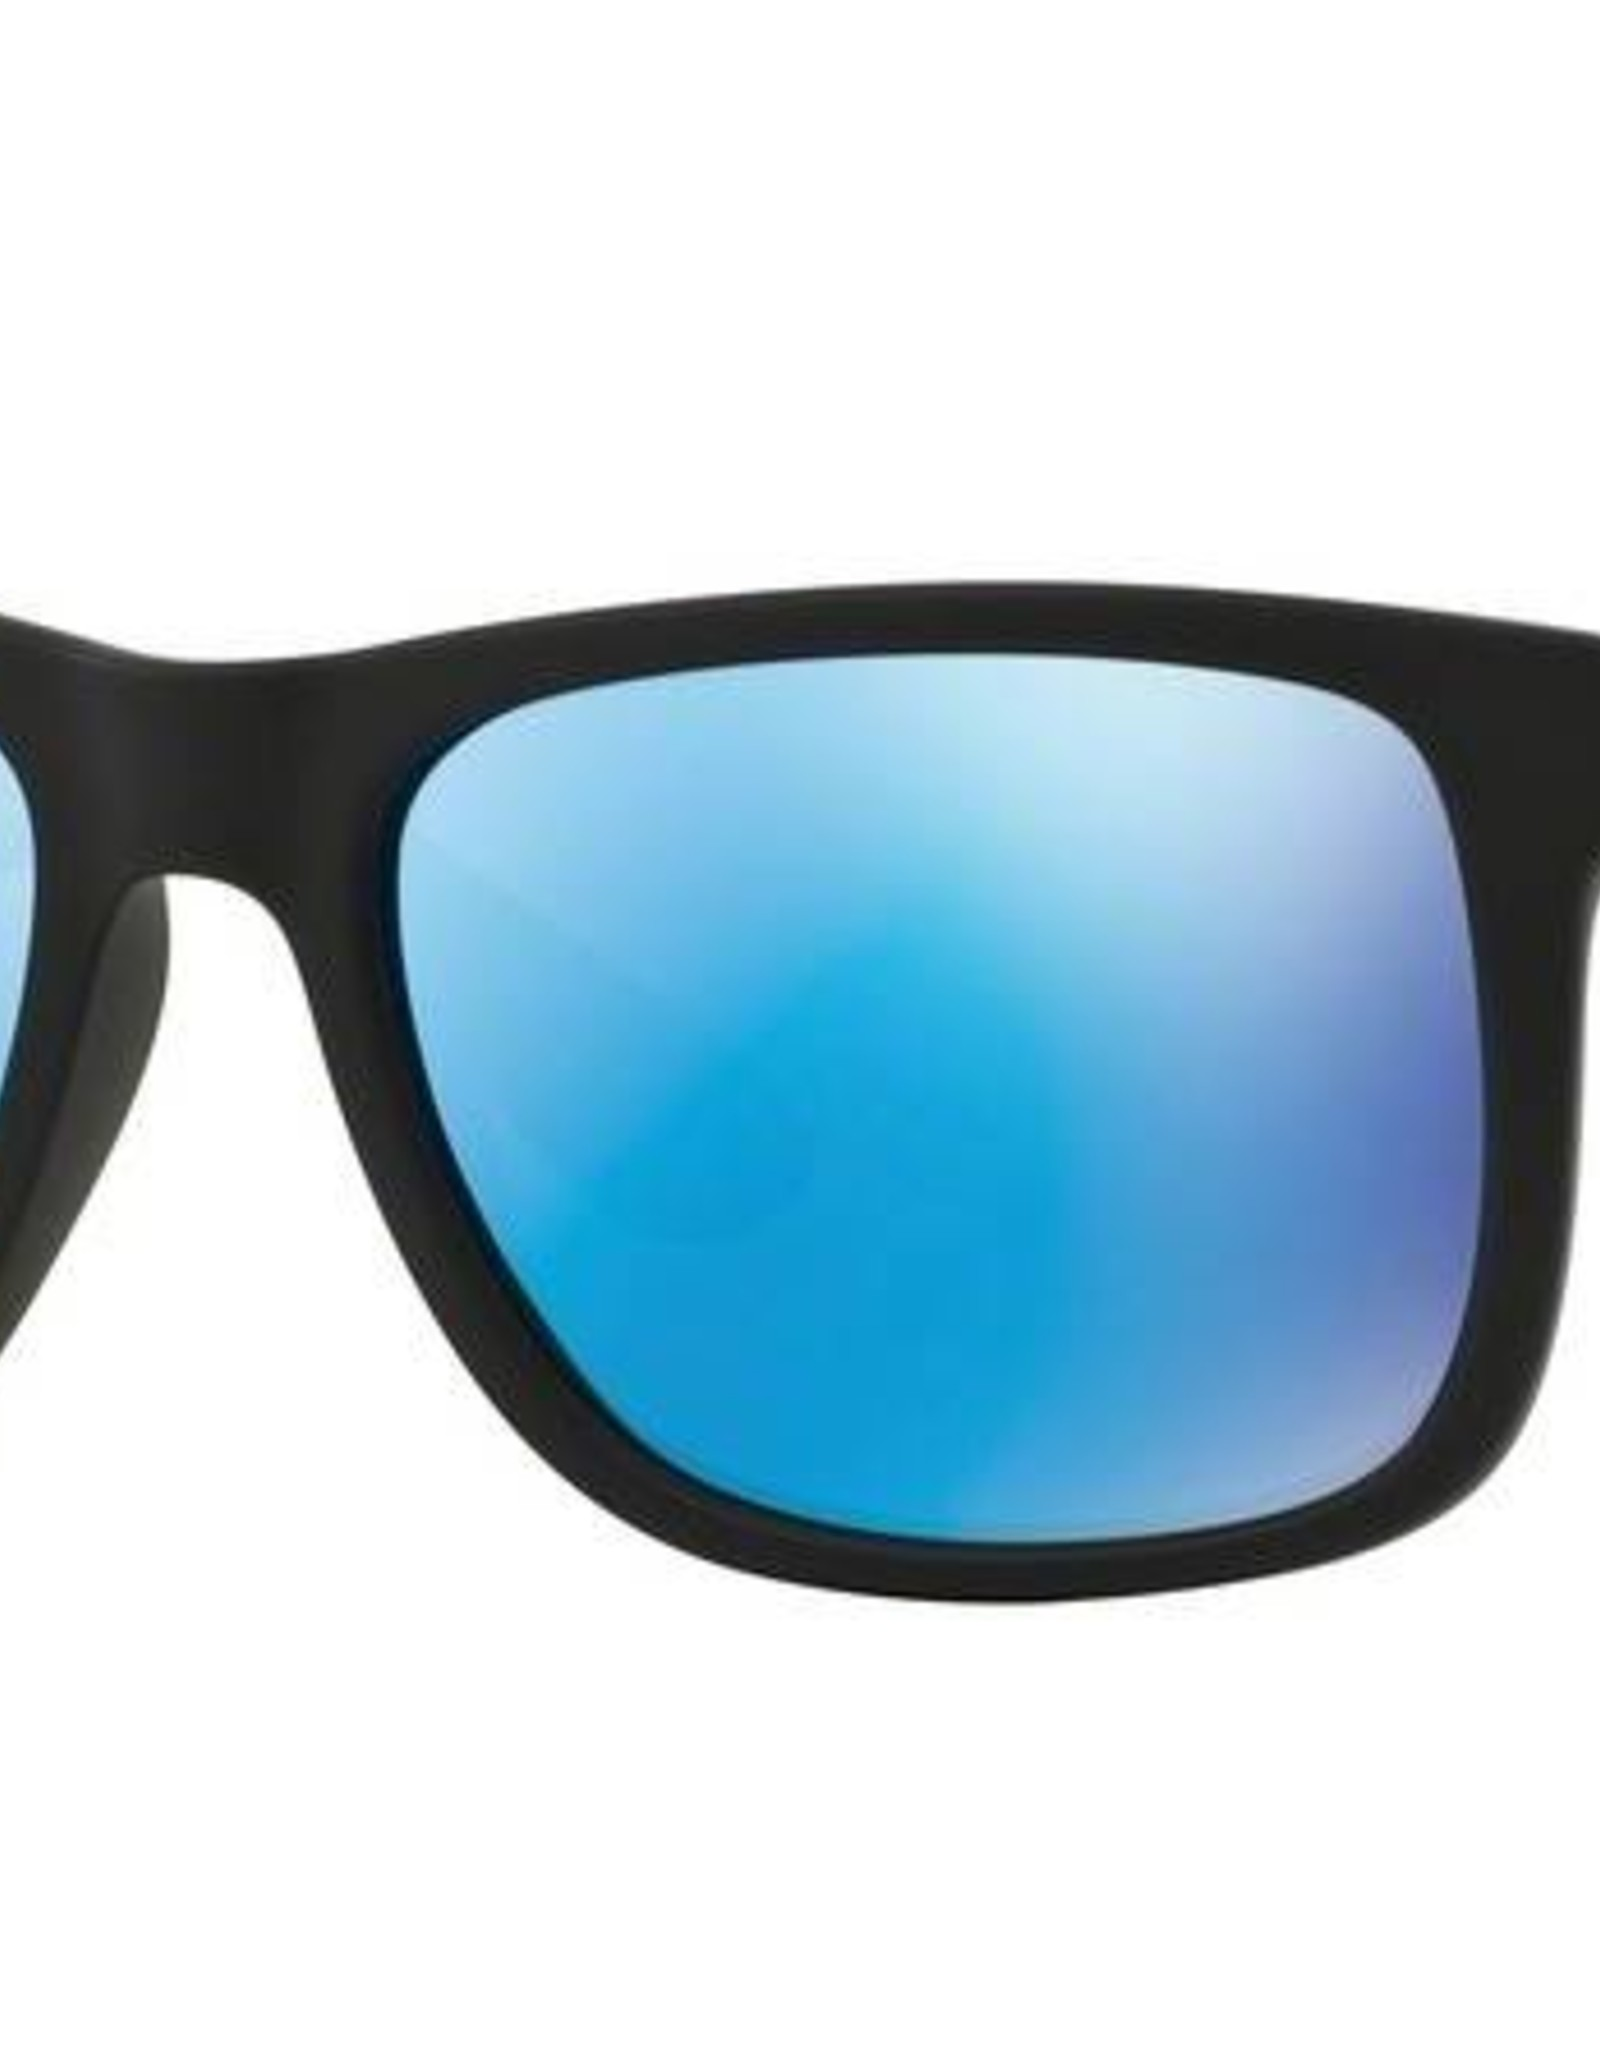 Ray-Ban Ray-Ban - JUSTIN 55 (622/55) - Rubber Black w/ Blue Mirror